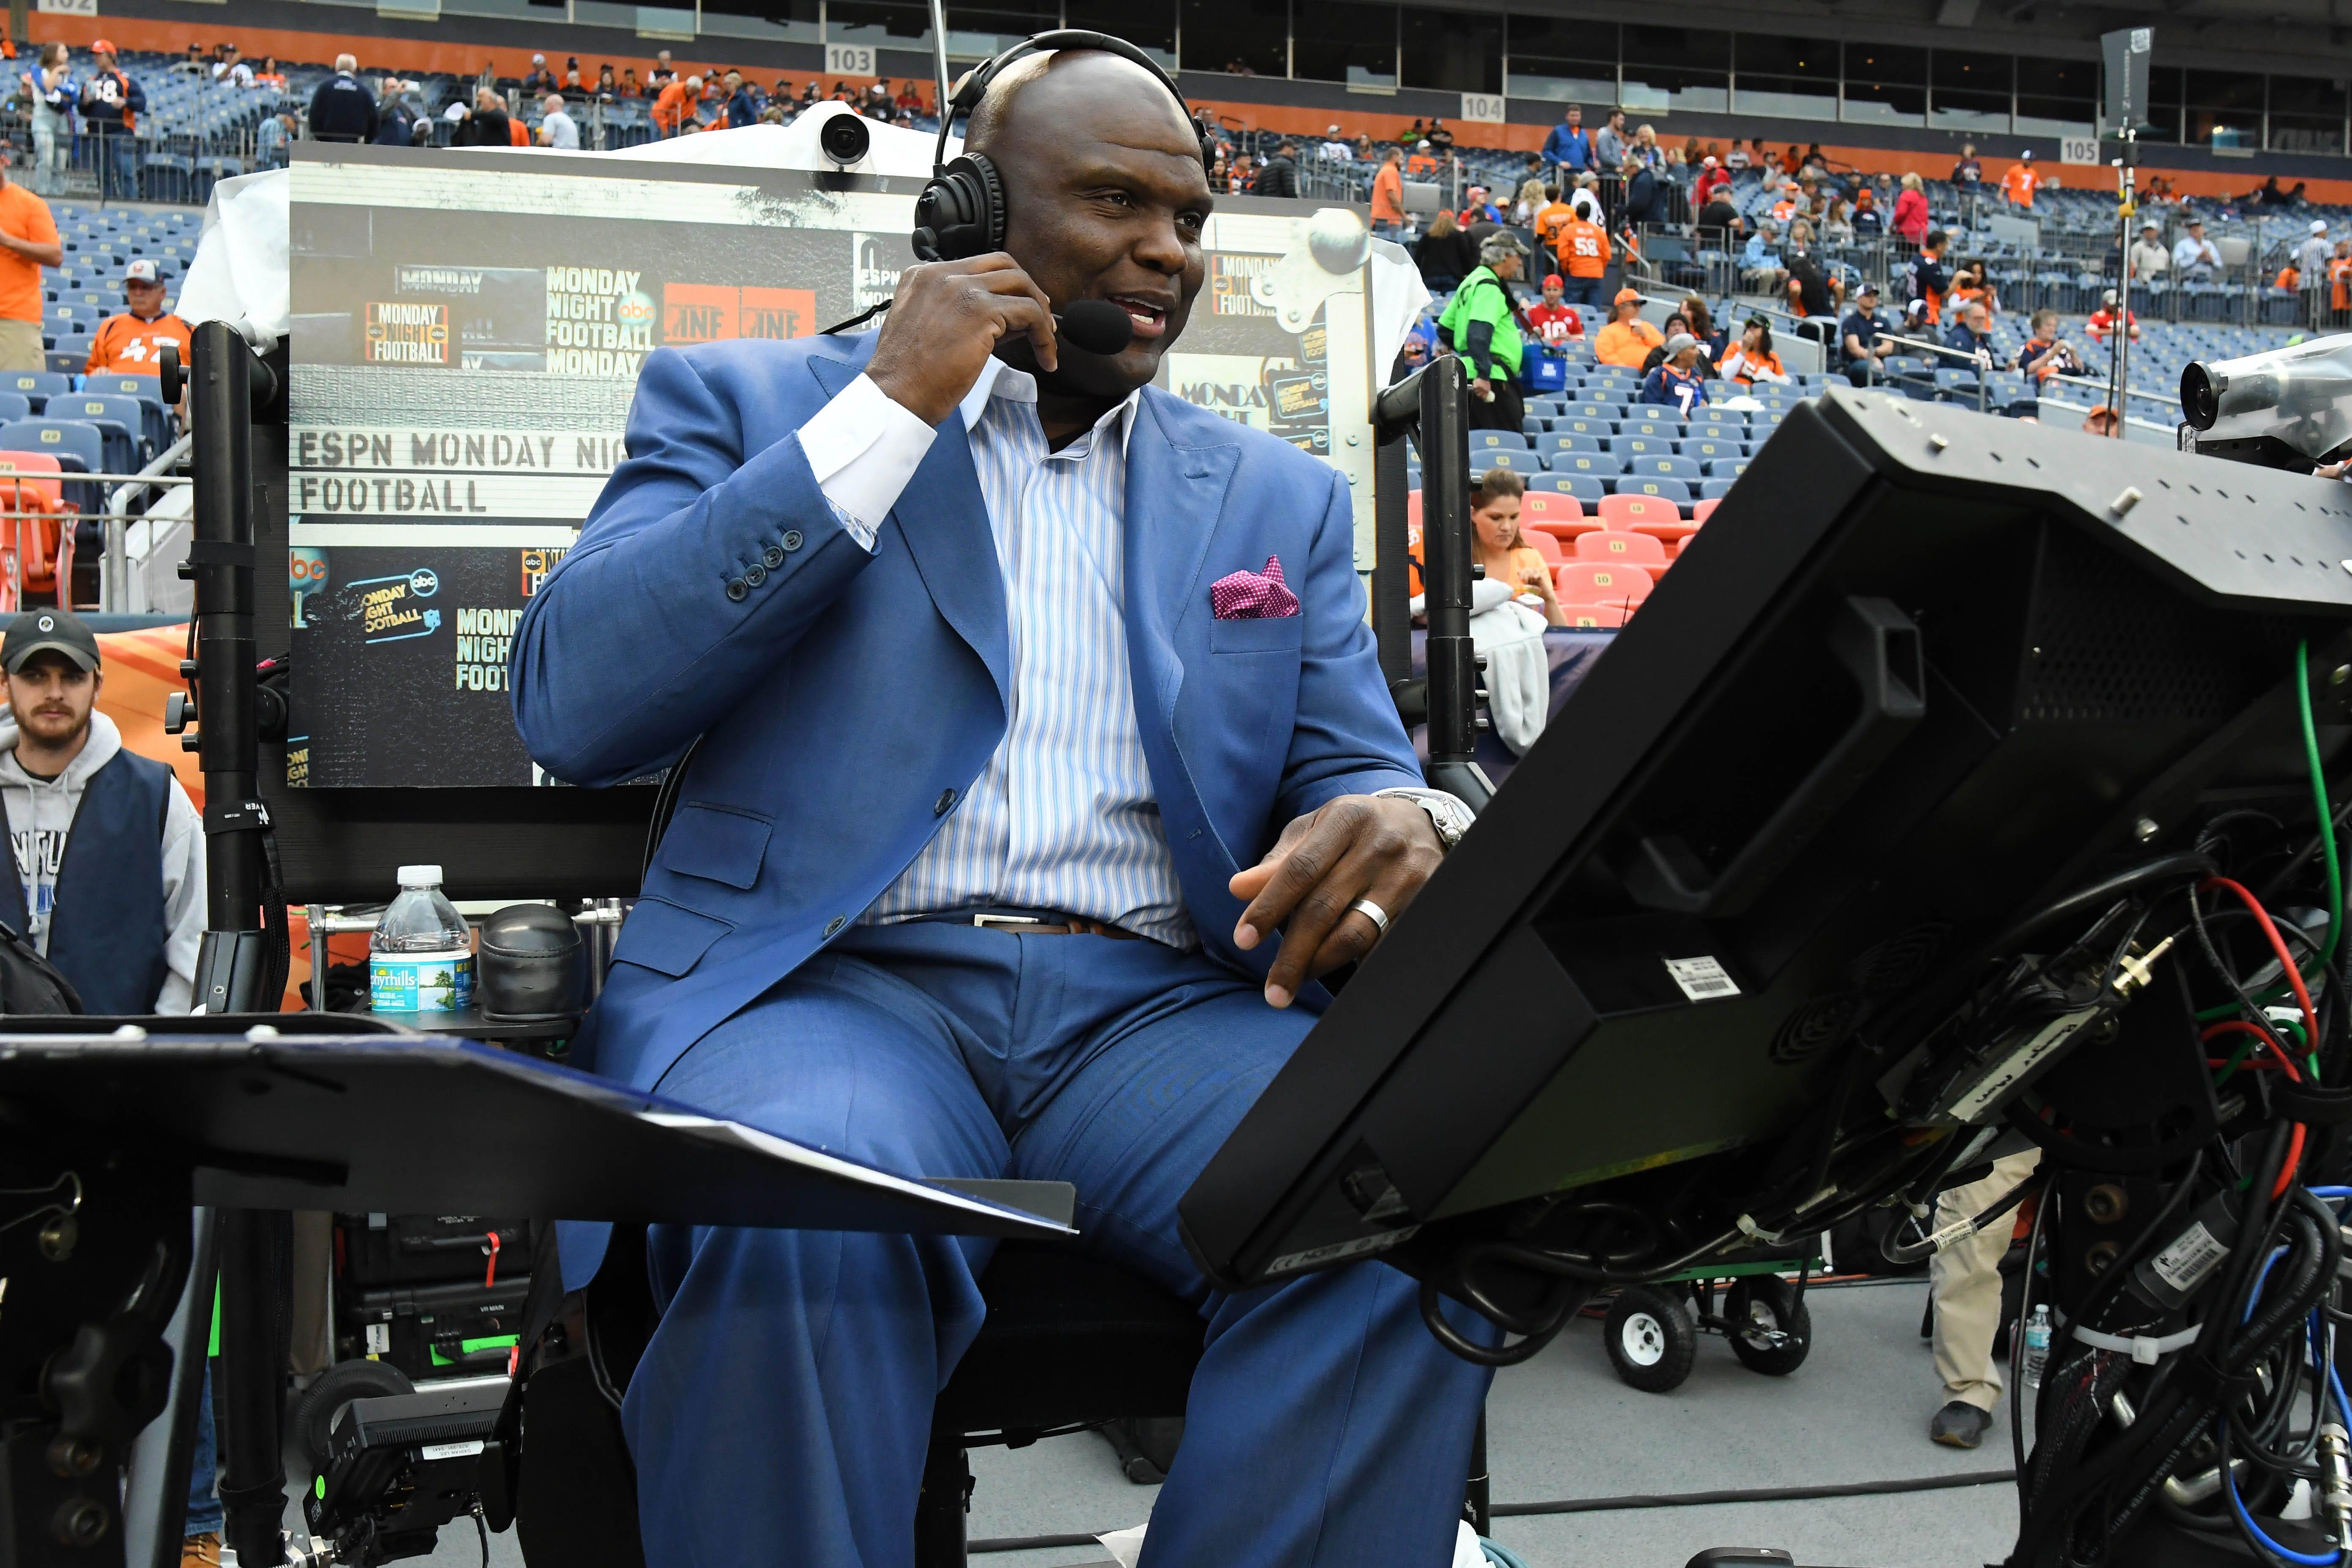 ESPN's Booger McFarland ready to talk Odell Beckham's watch, Bountygate as 'MNF' analyst